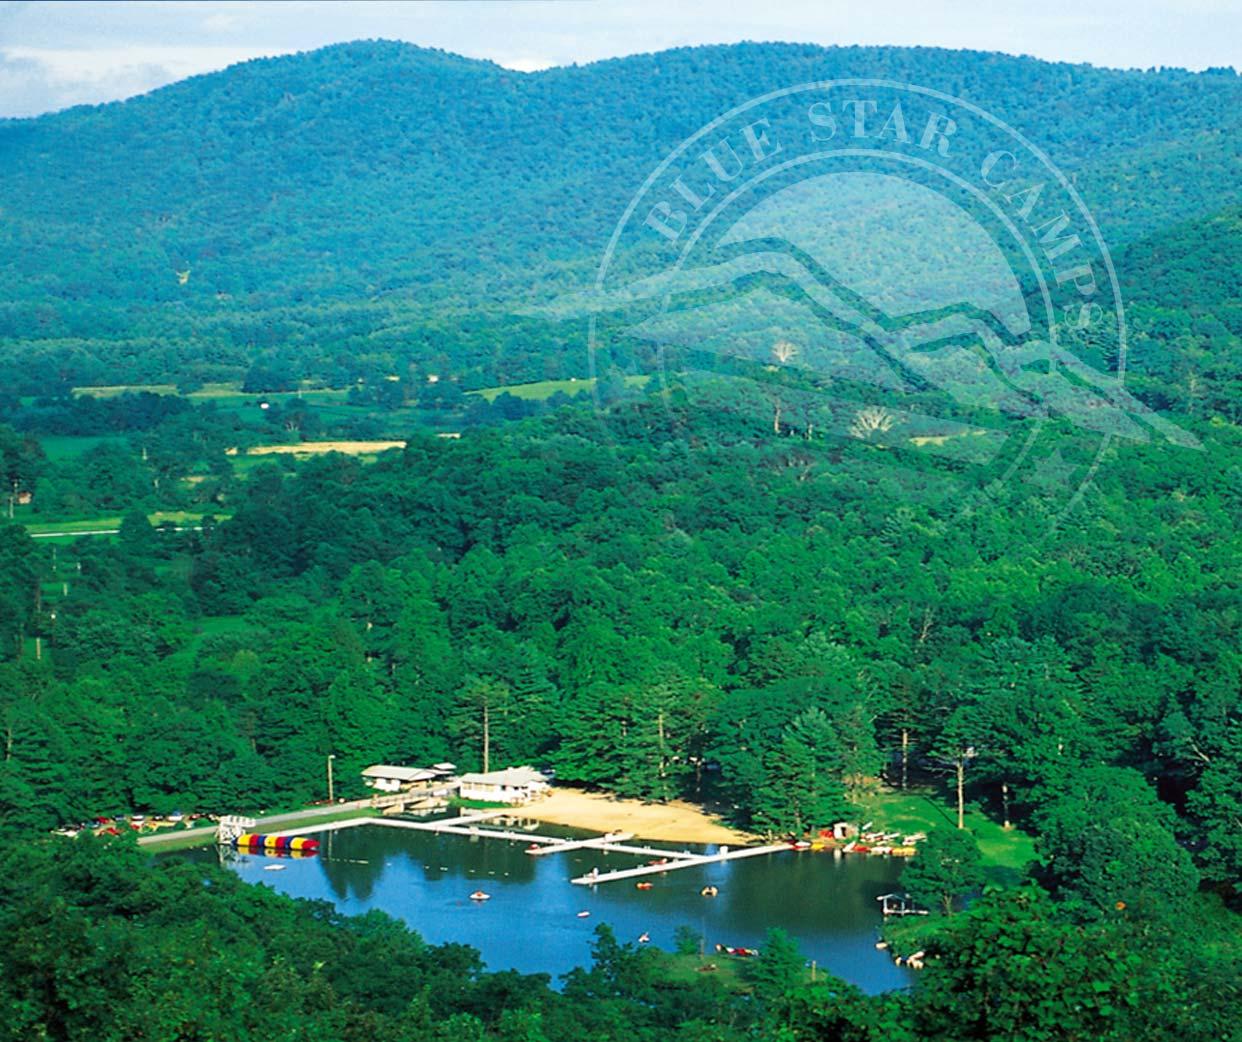 Blue Star Camps | North Carolina Coed Summer Camp